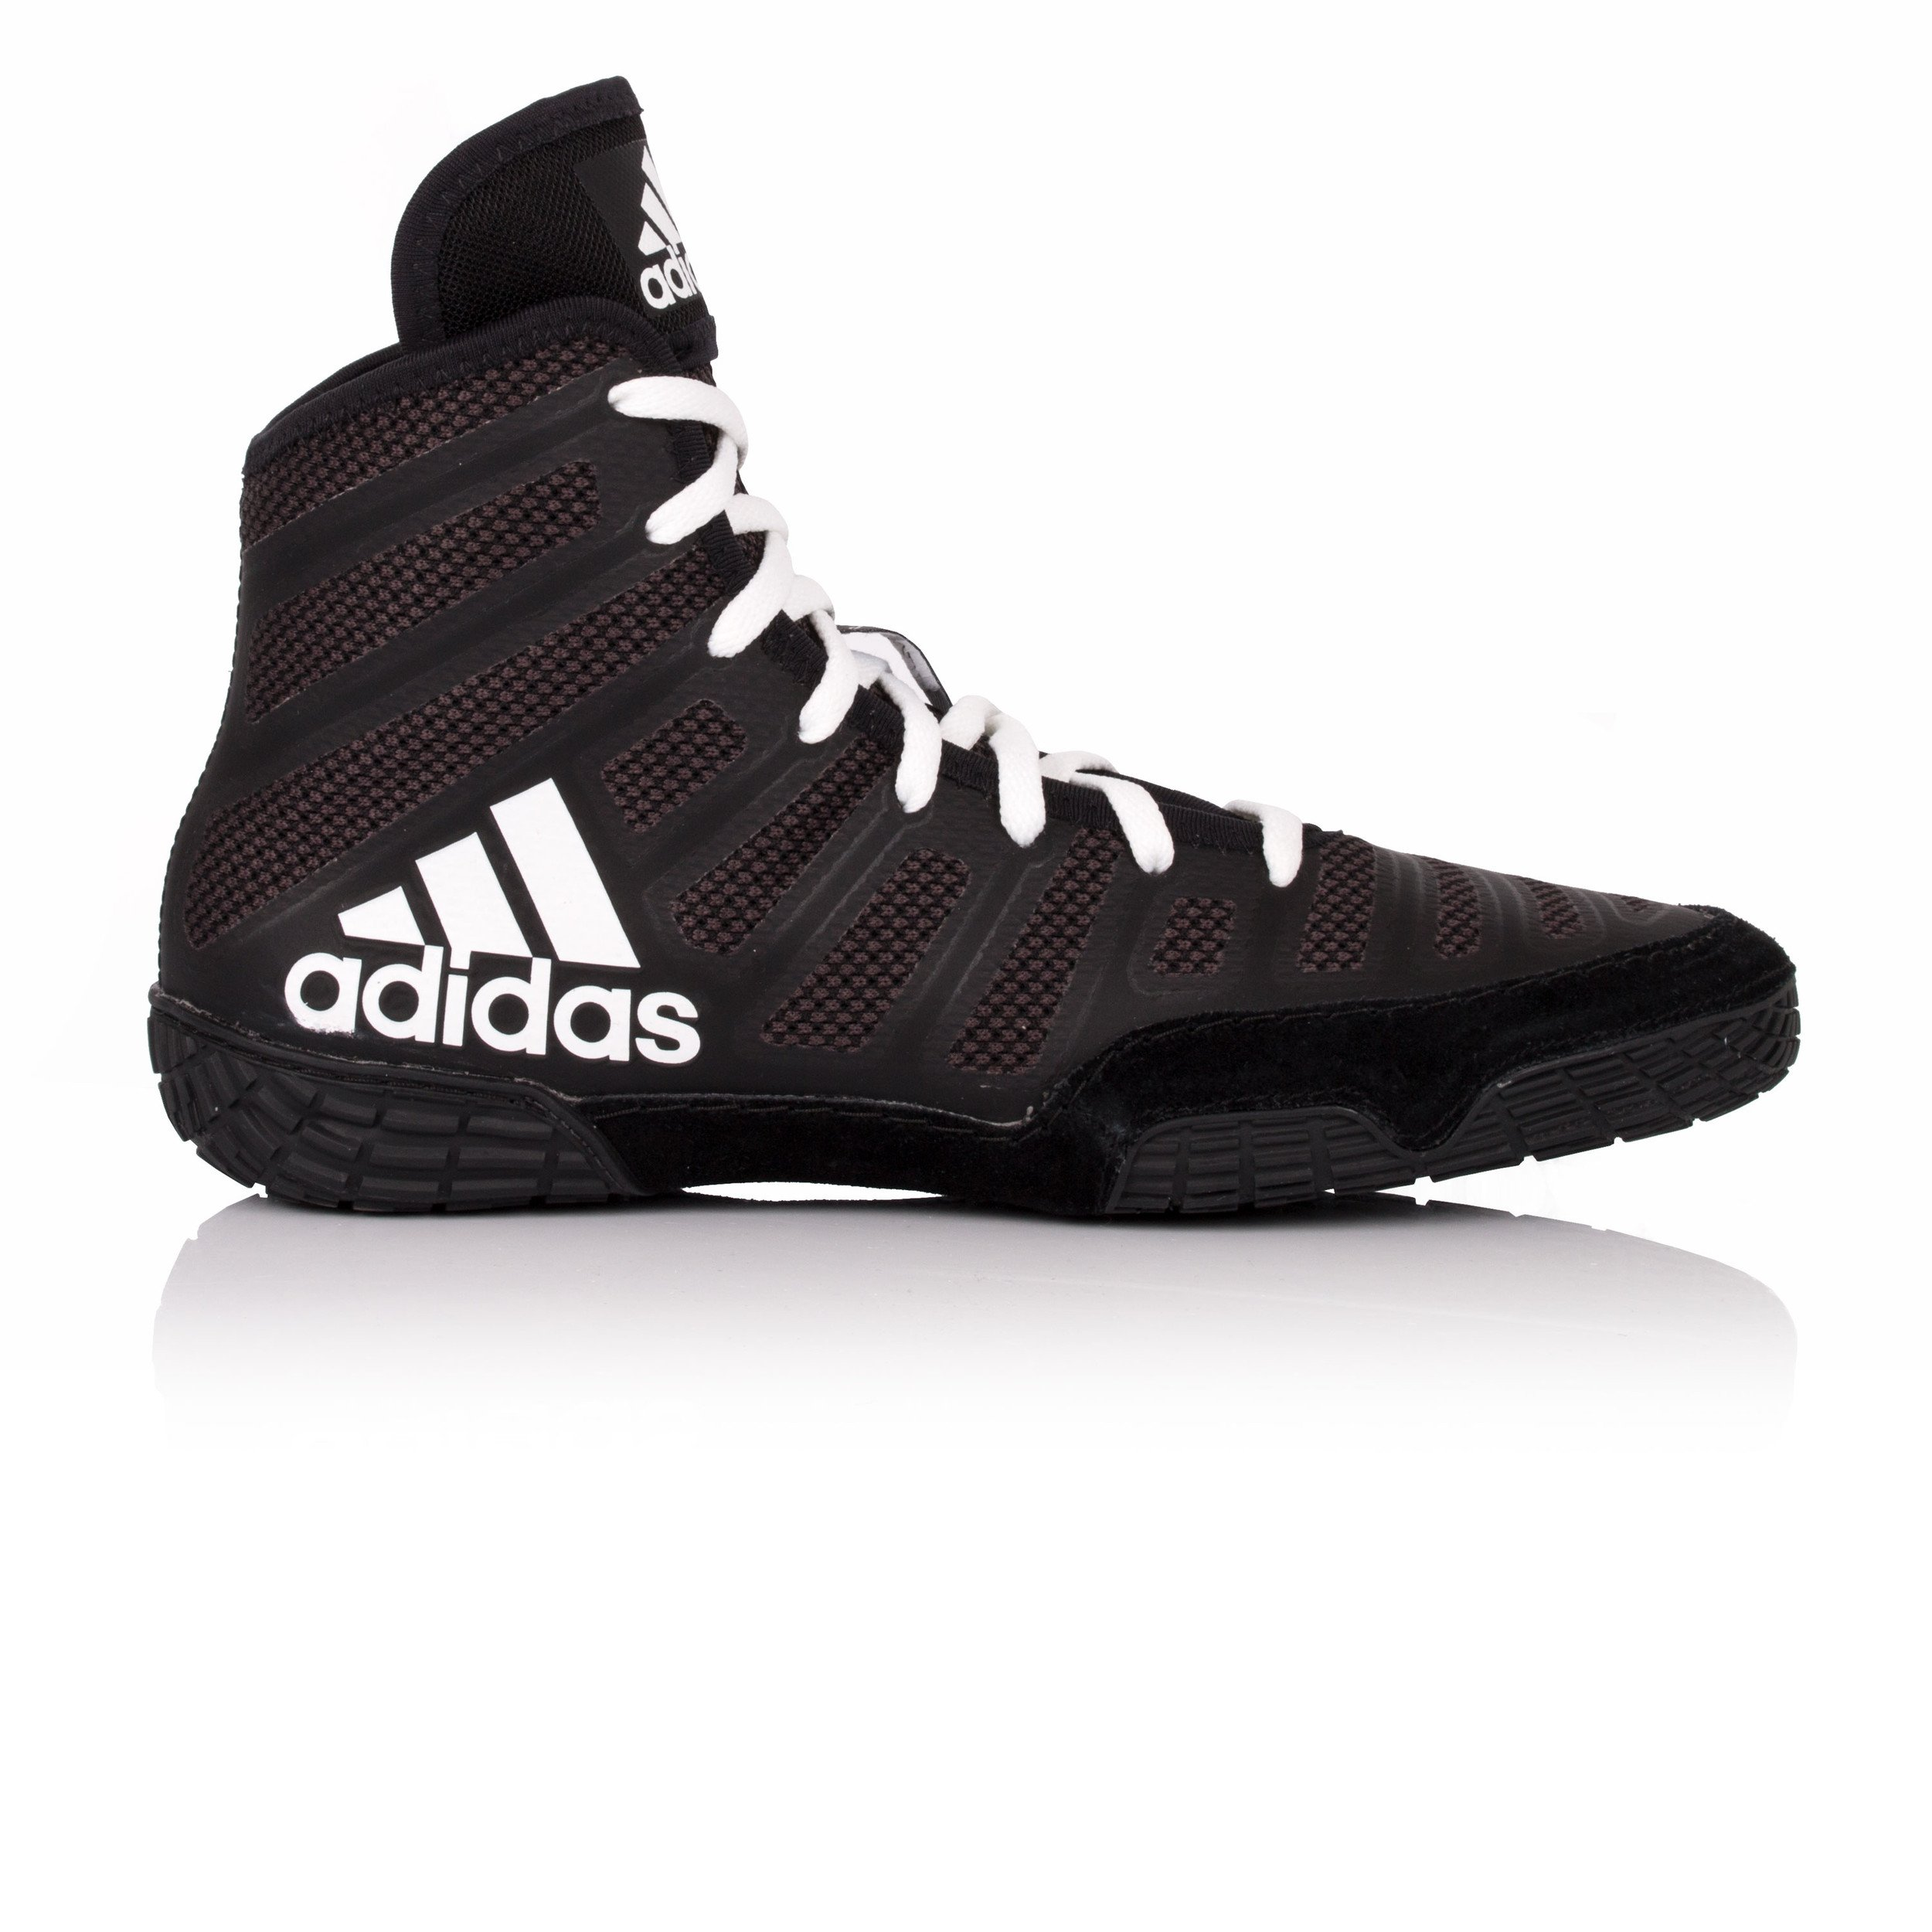 Adidas Varner Wrestling Boots - SS18-10.5 - Black